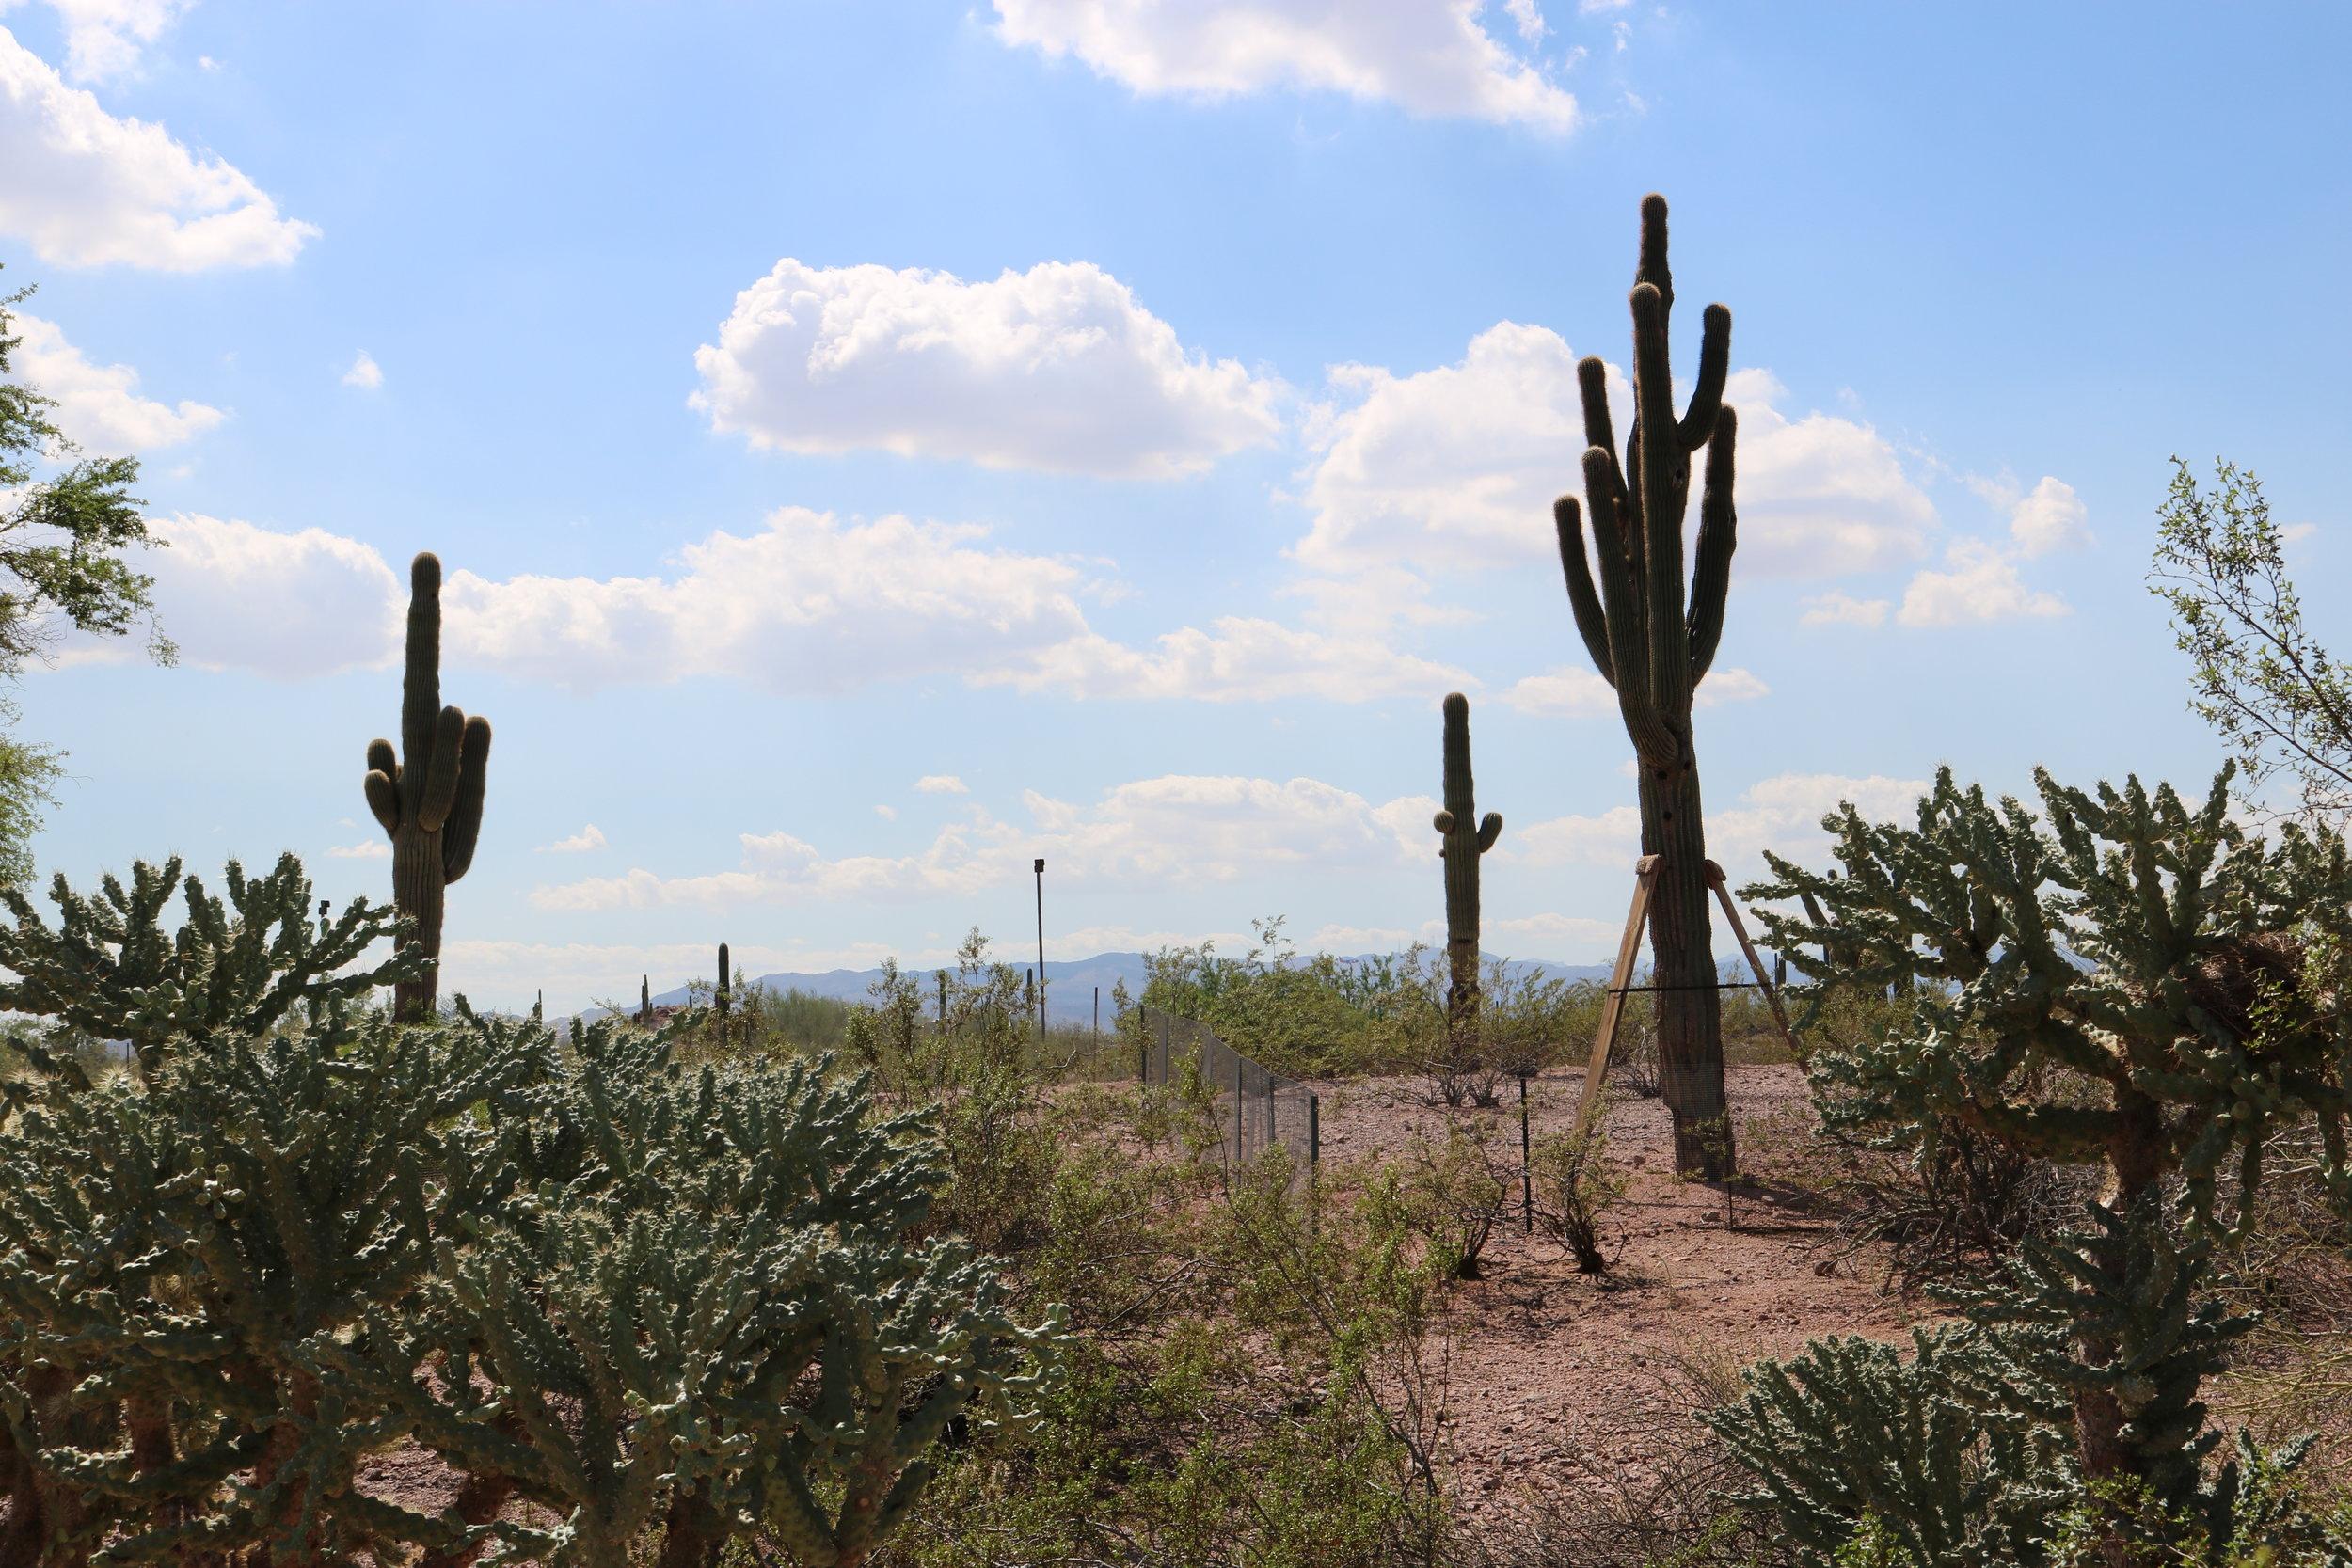 My photo taken at the Desert Botanic Garden in Phoenix - I've taken some liberties, and changed things around a bit.